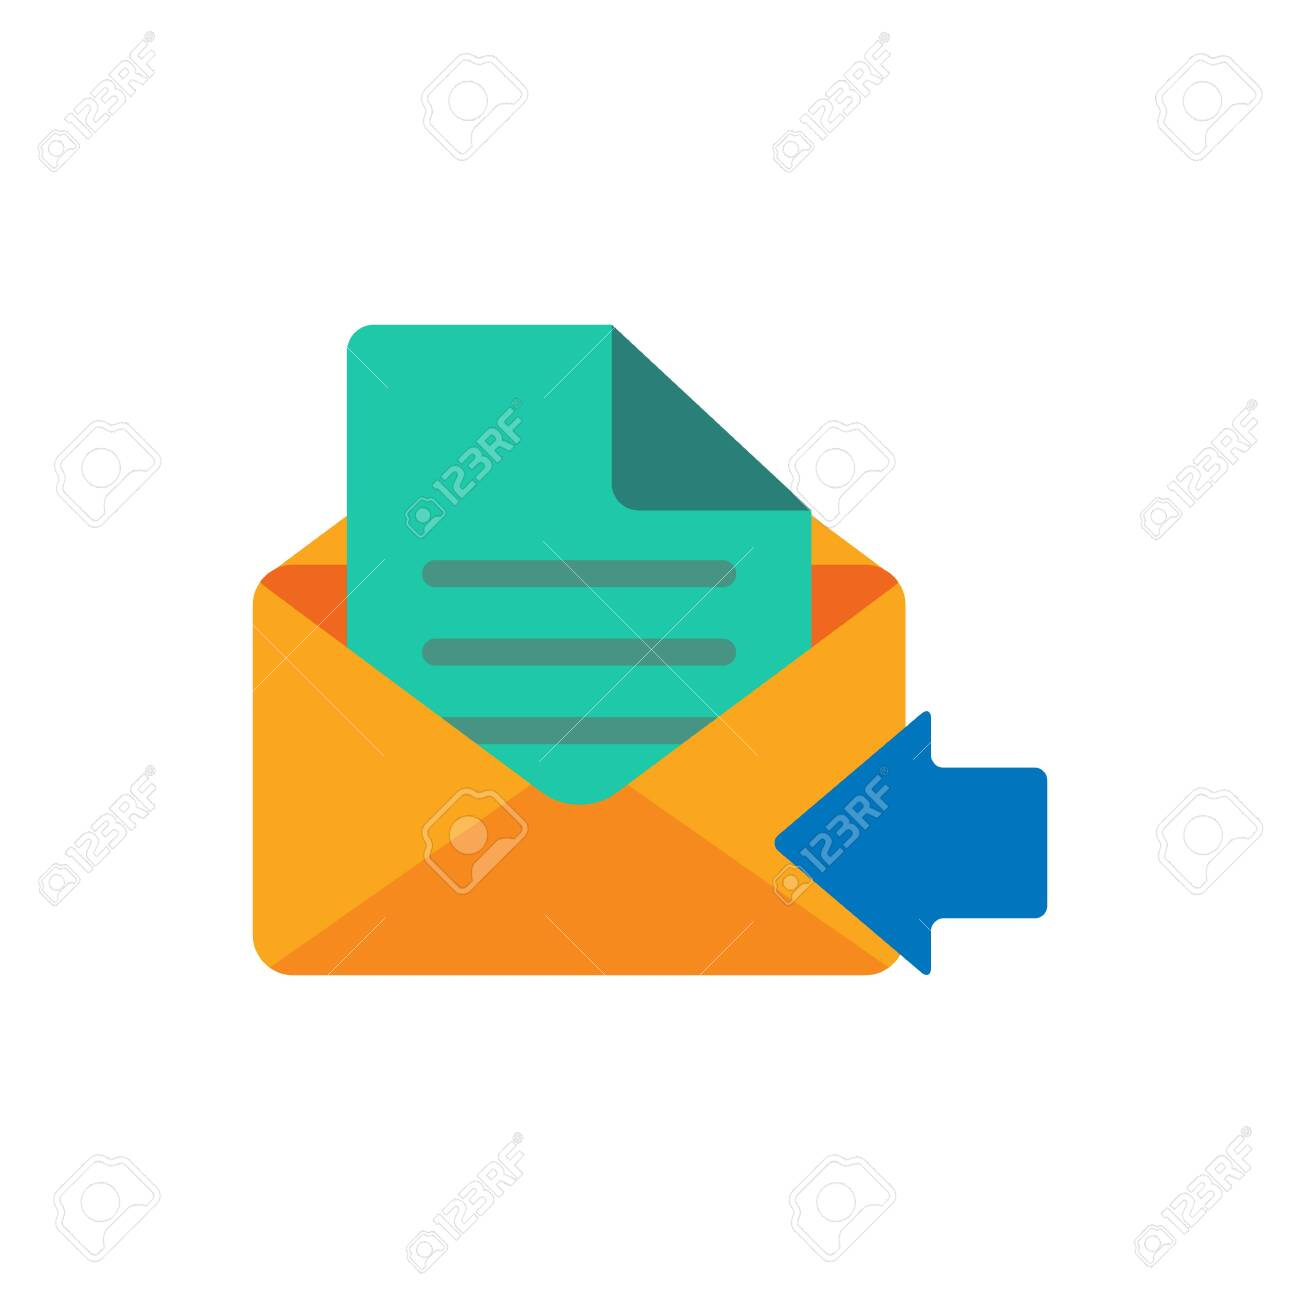 Receive Email Logo Icon Design - 106567635